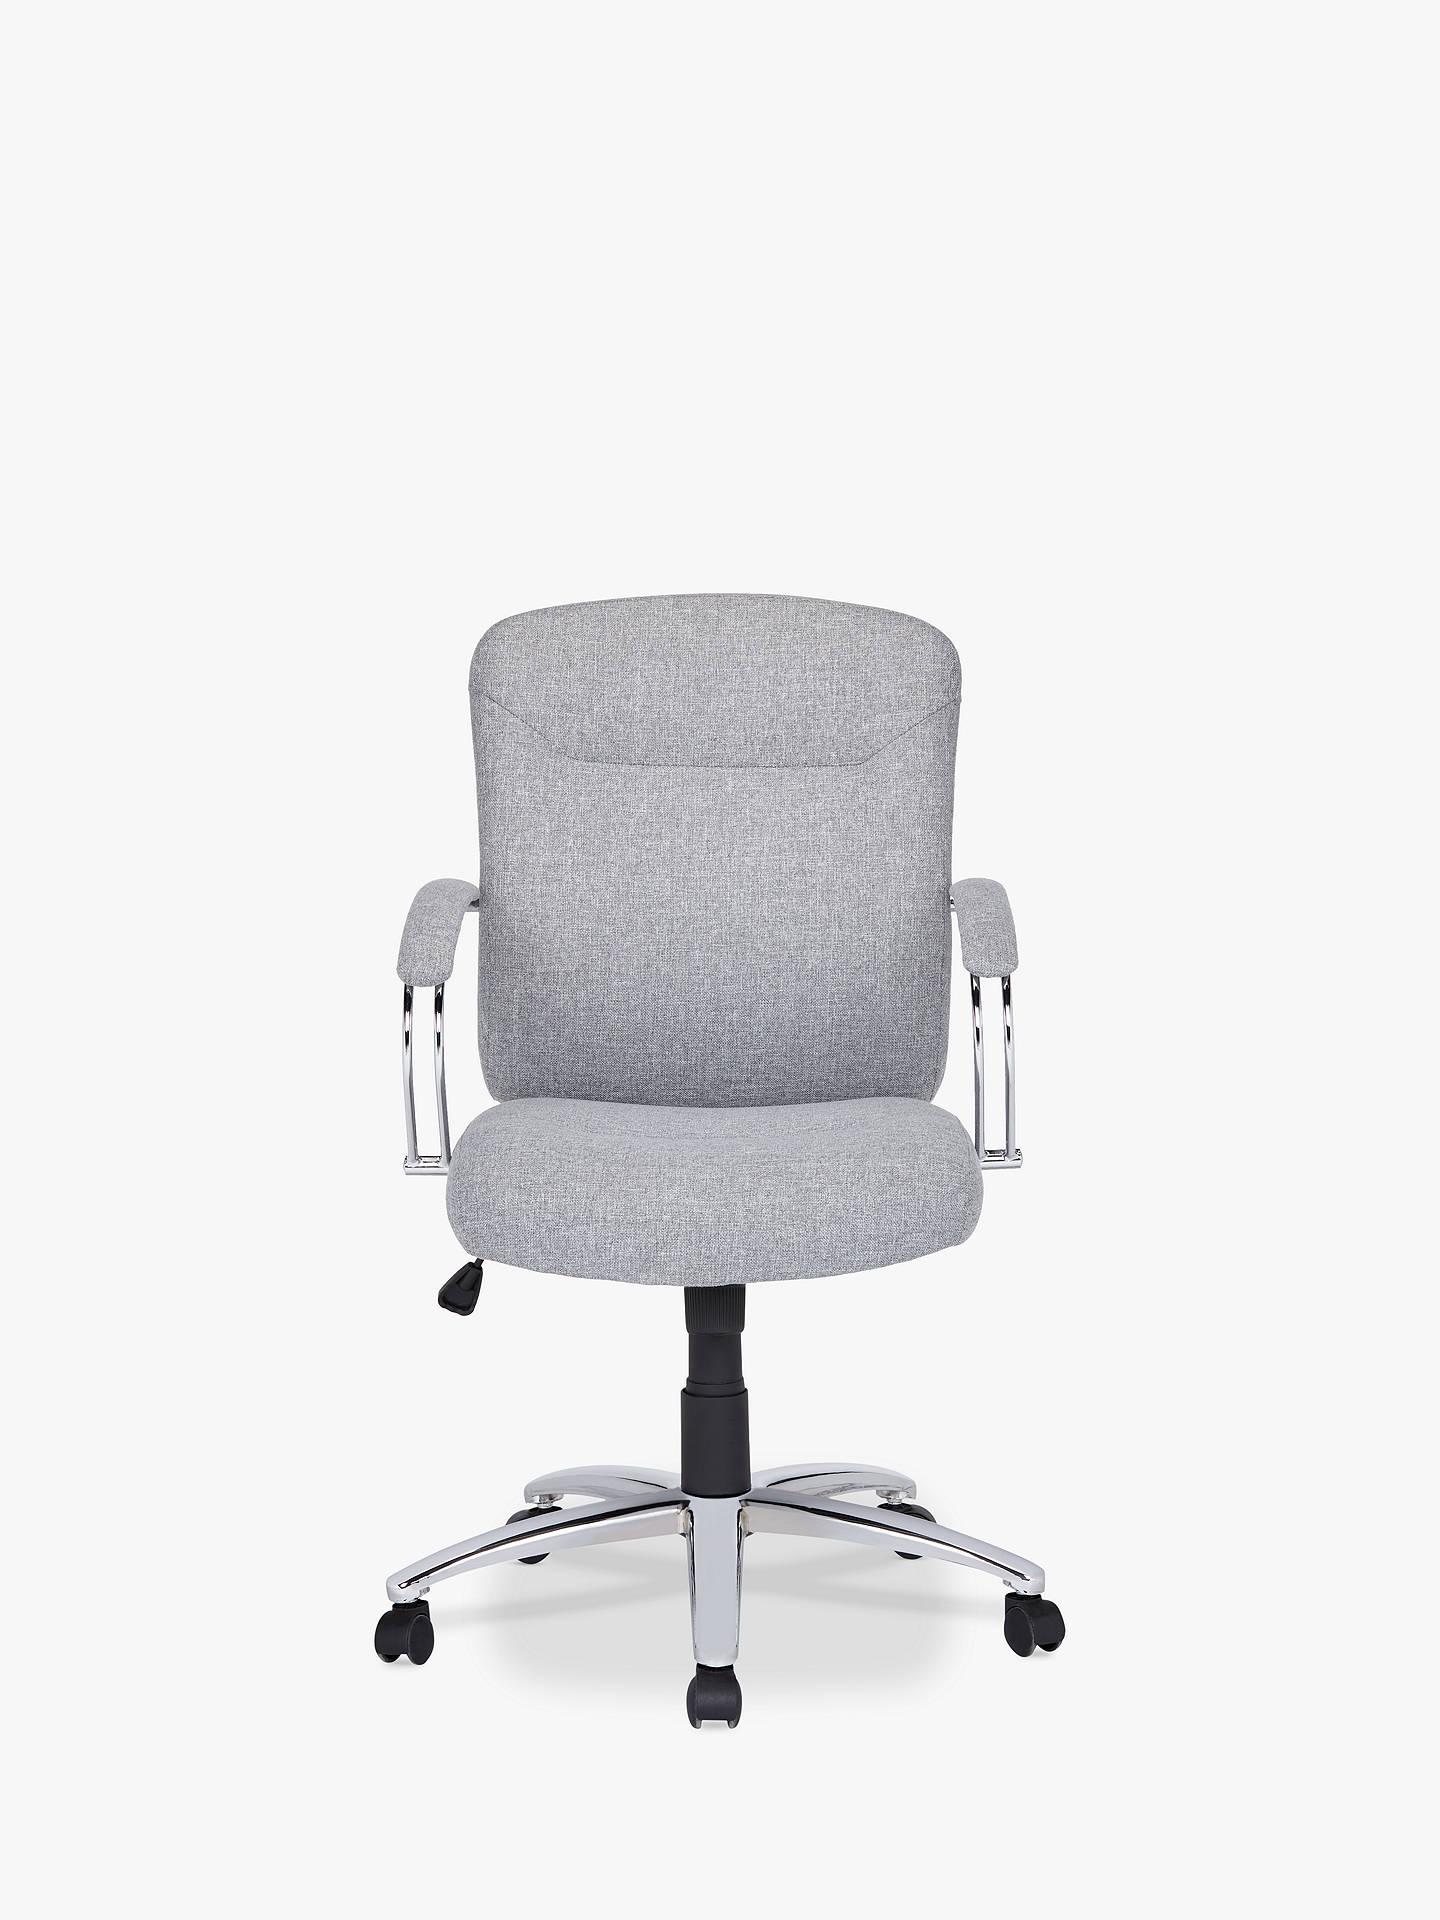 Buyjohn lewis partners warner fabric office chair grey online at johnlewis